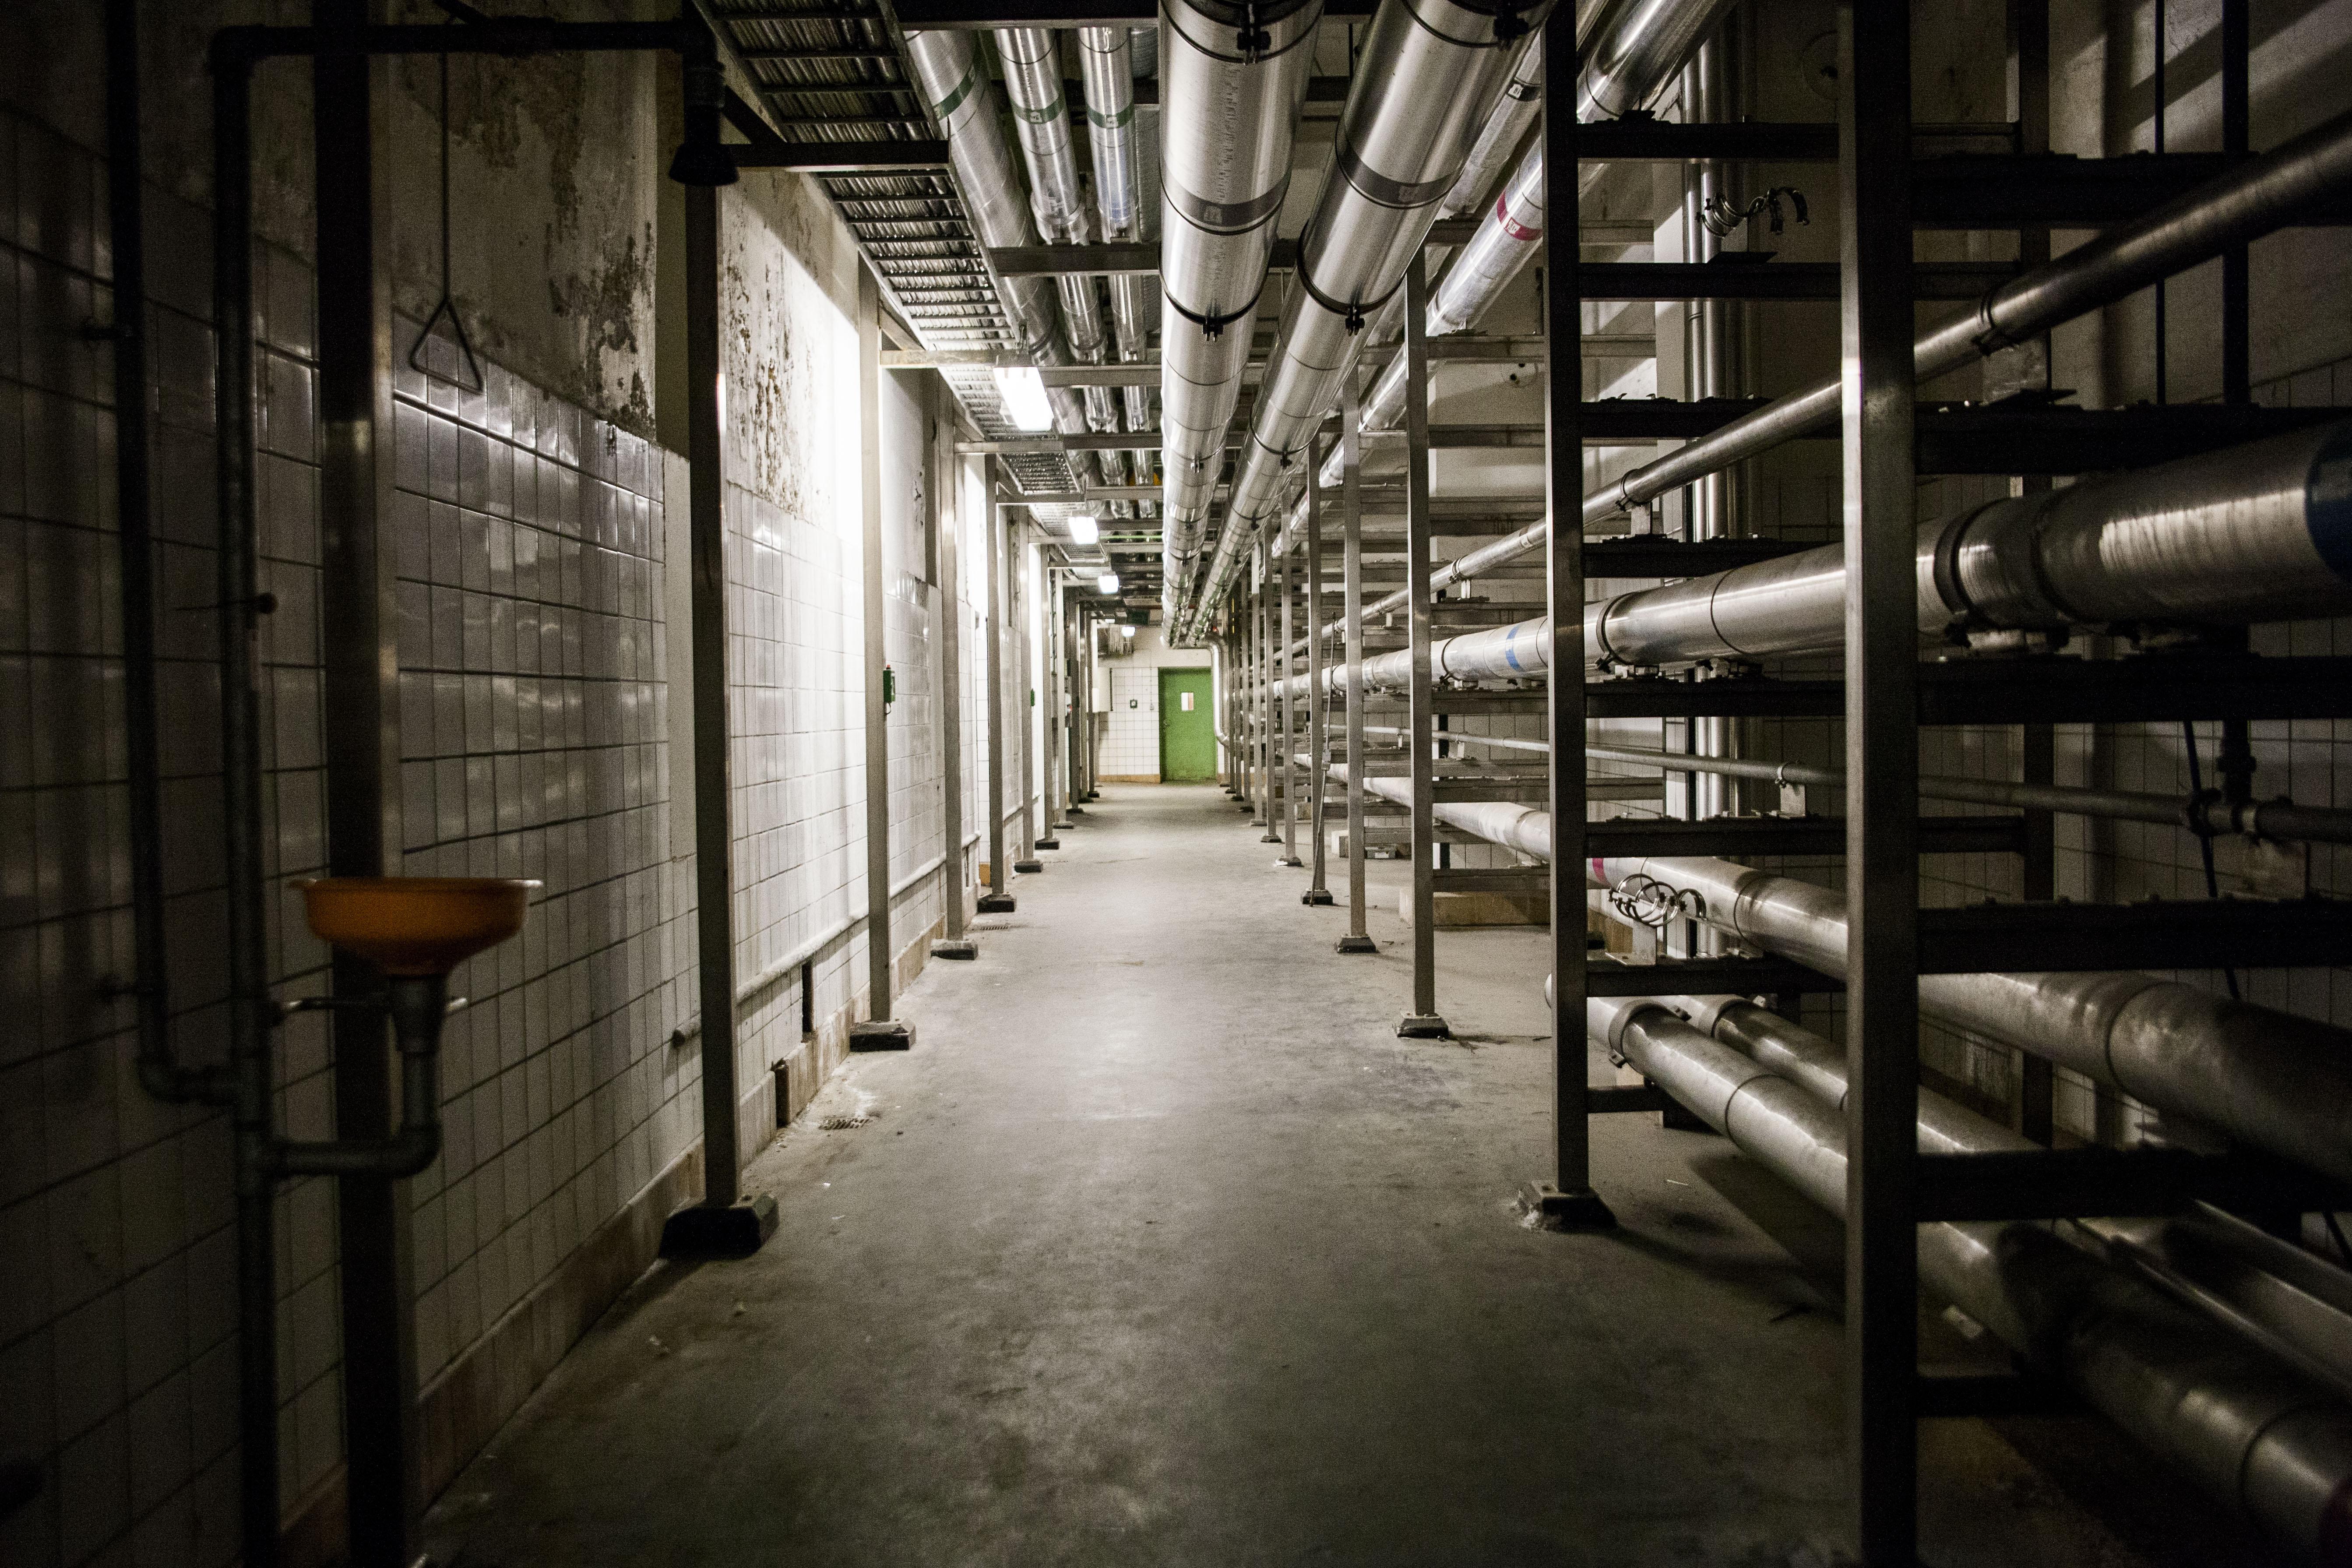 Carlsberg_underground_HelenaLundquist_mindre_4